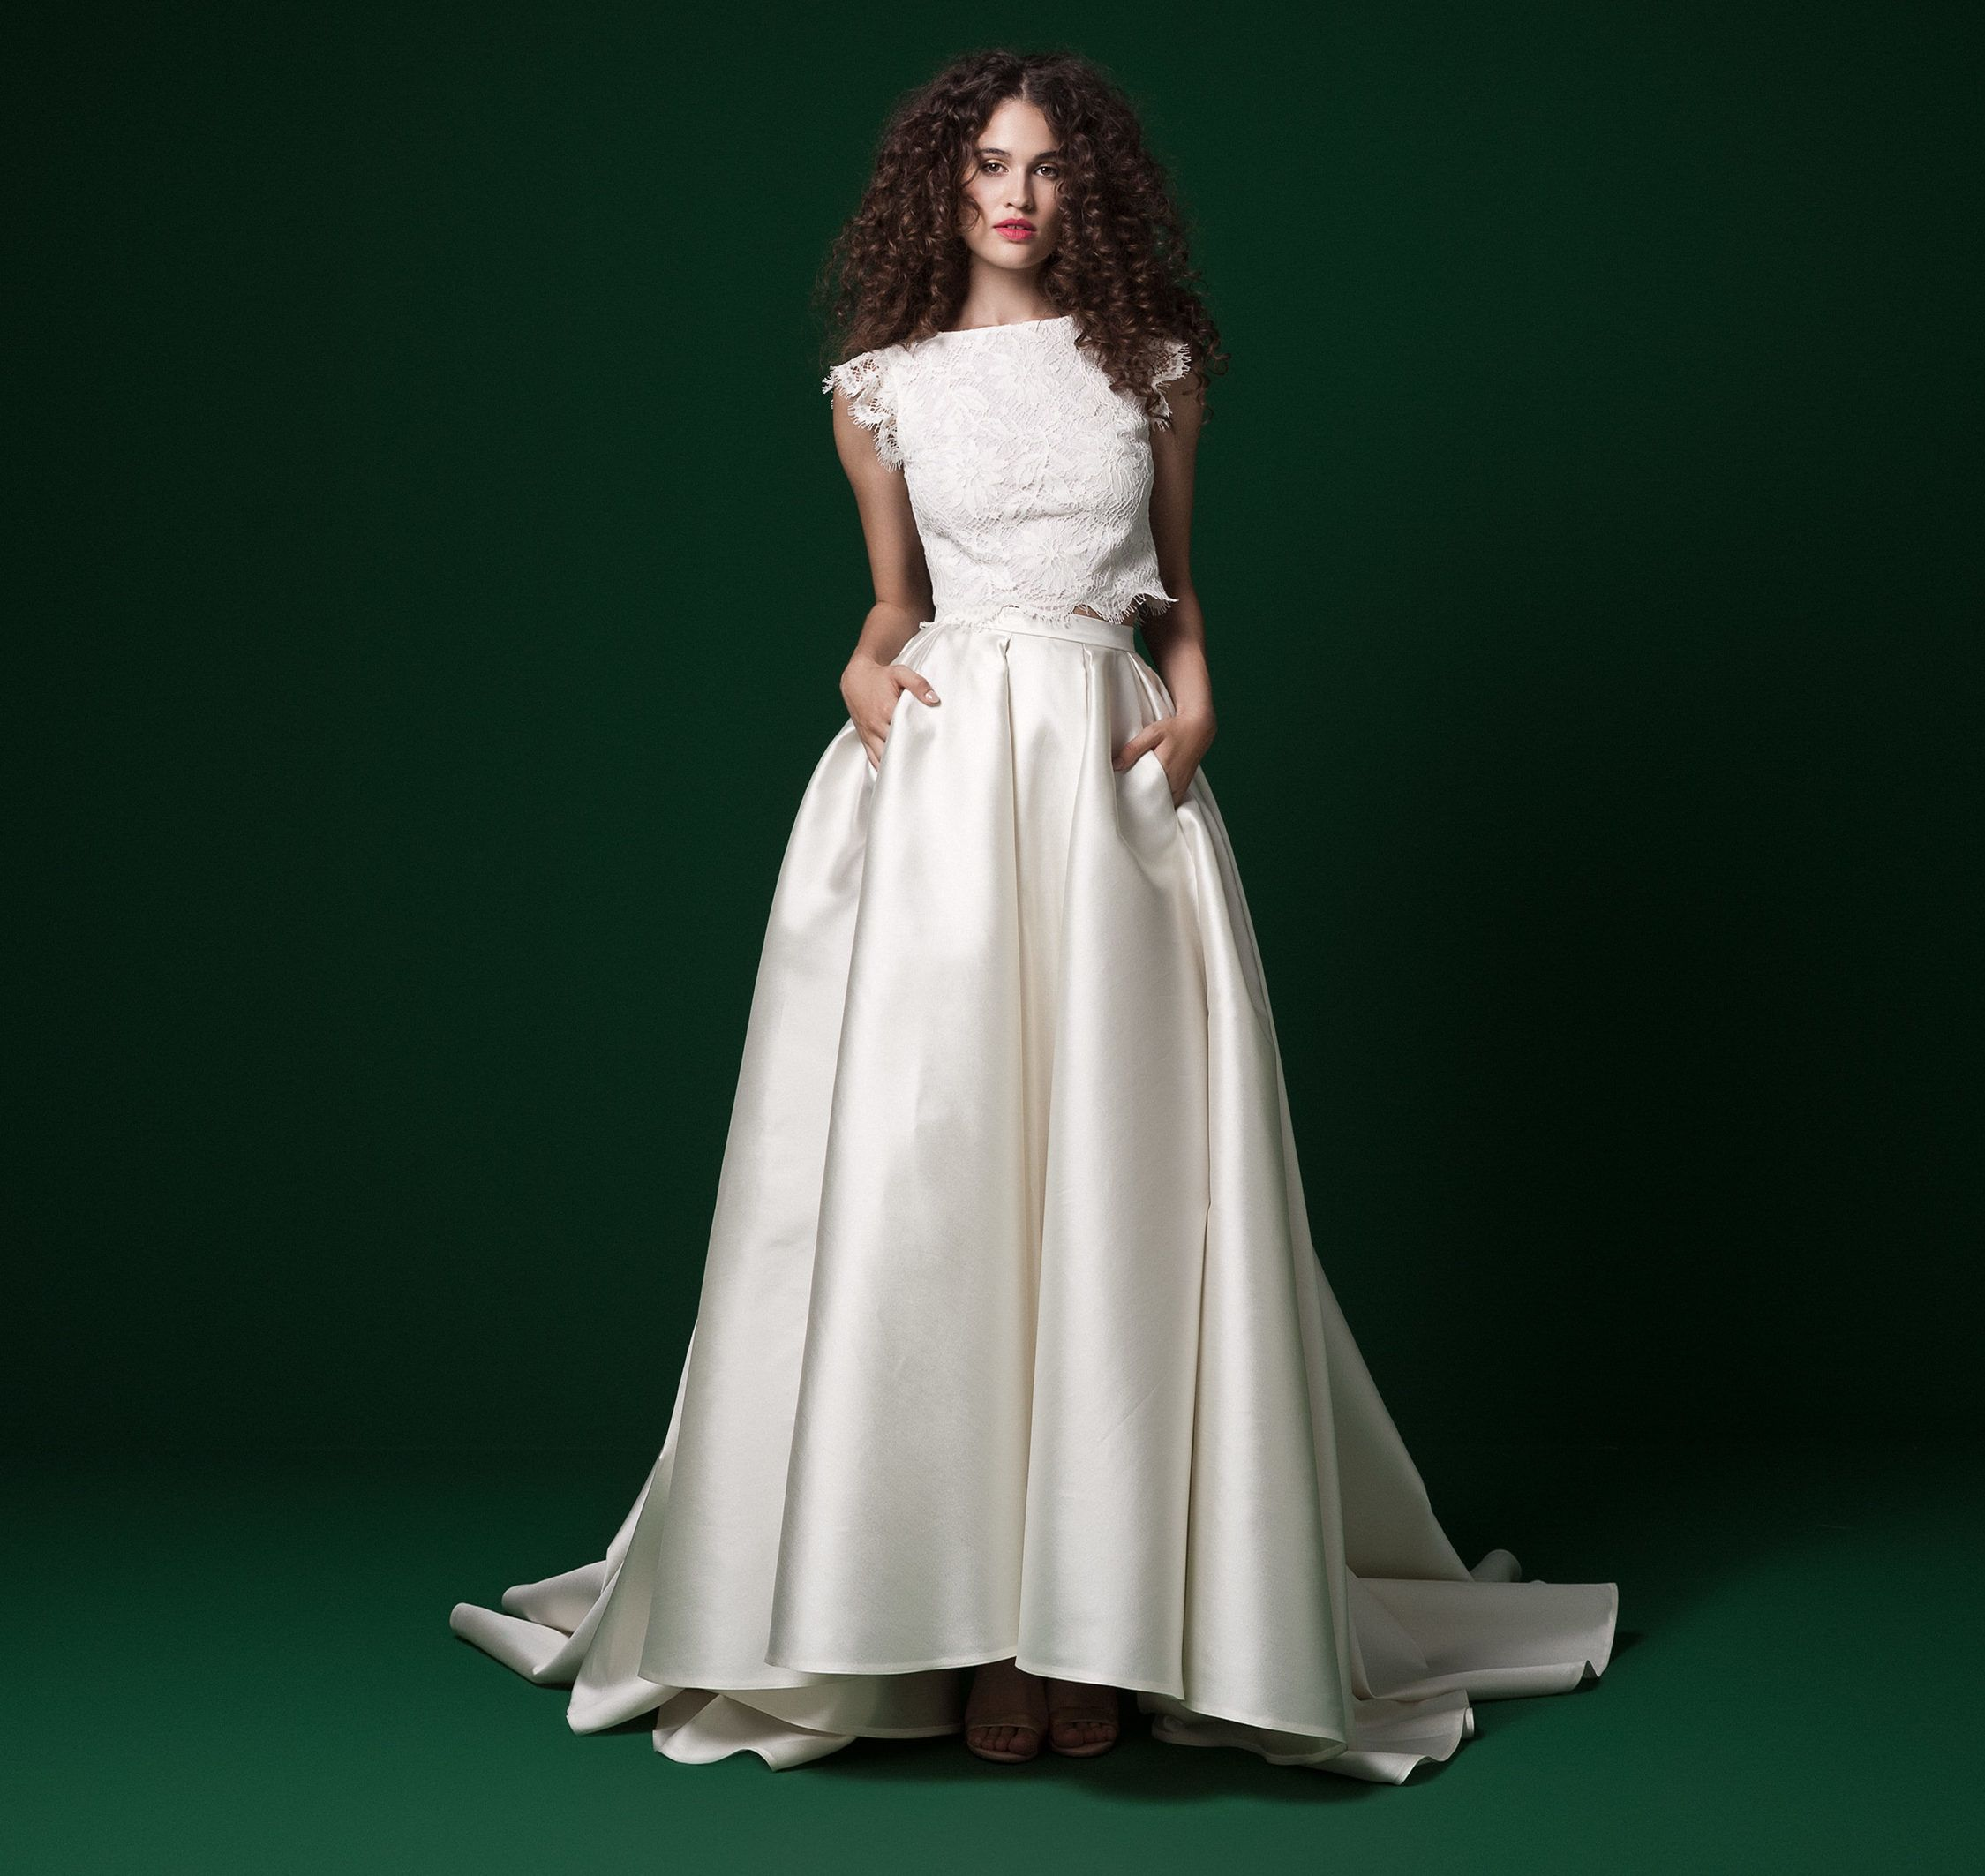 103054e94f Ilyen lehetett Liptai Claudia menyasszonyi ruhája. Daalarna menyasszonyi  ruha ...